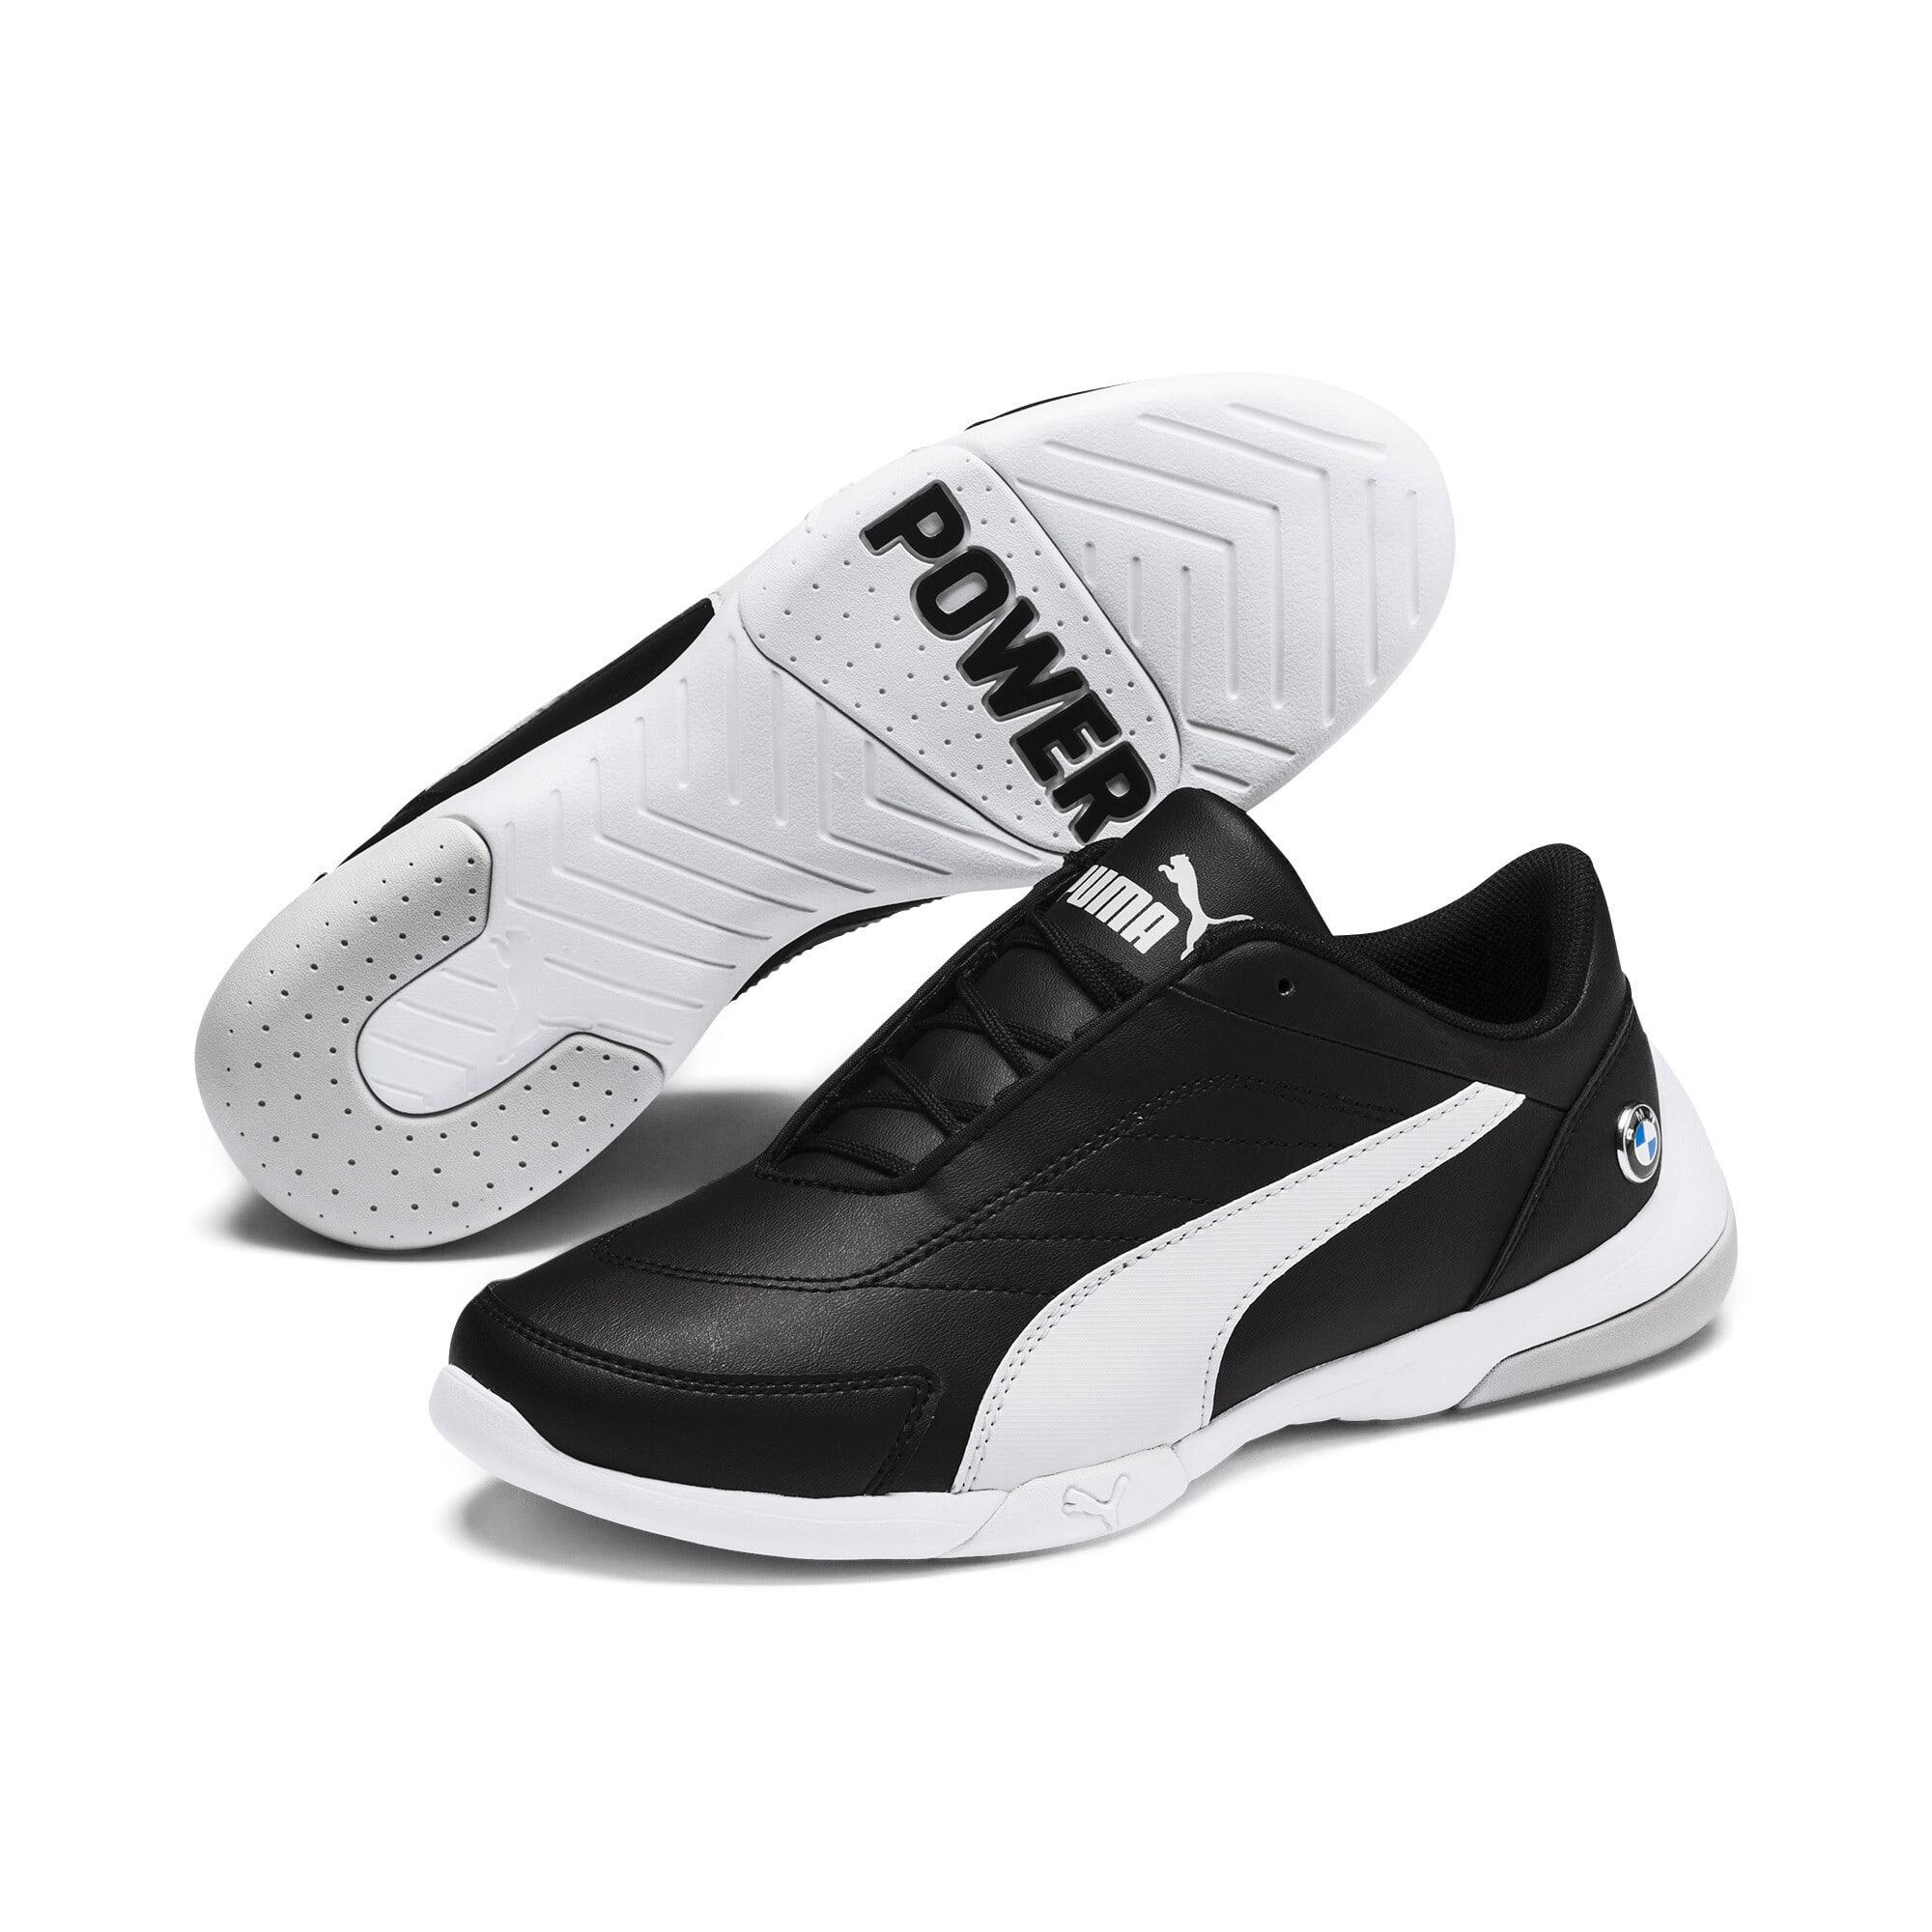 Thumbnail 2 of BMW MMS Kart Cat III Shoes JR, Puma Black-Gray Violet, medium